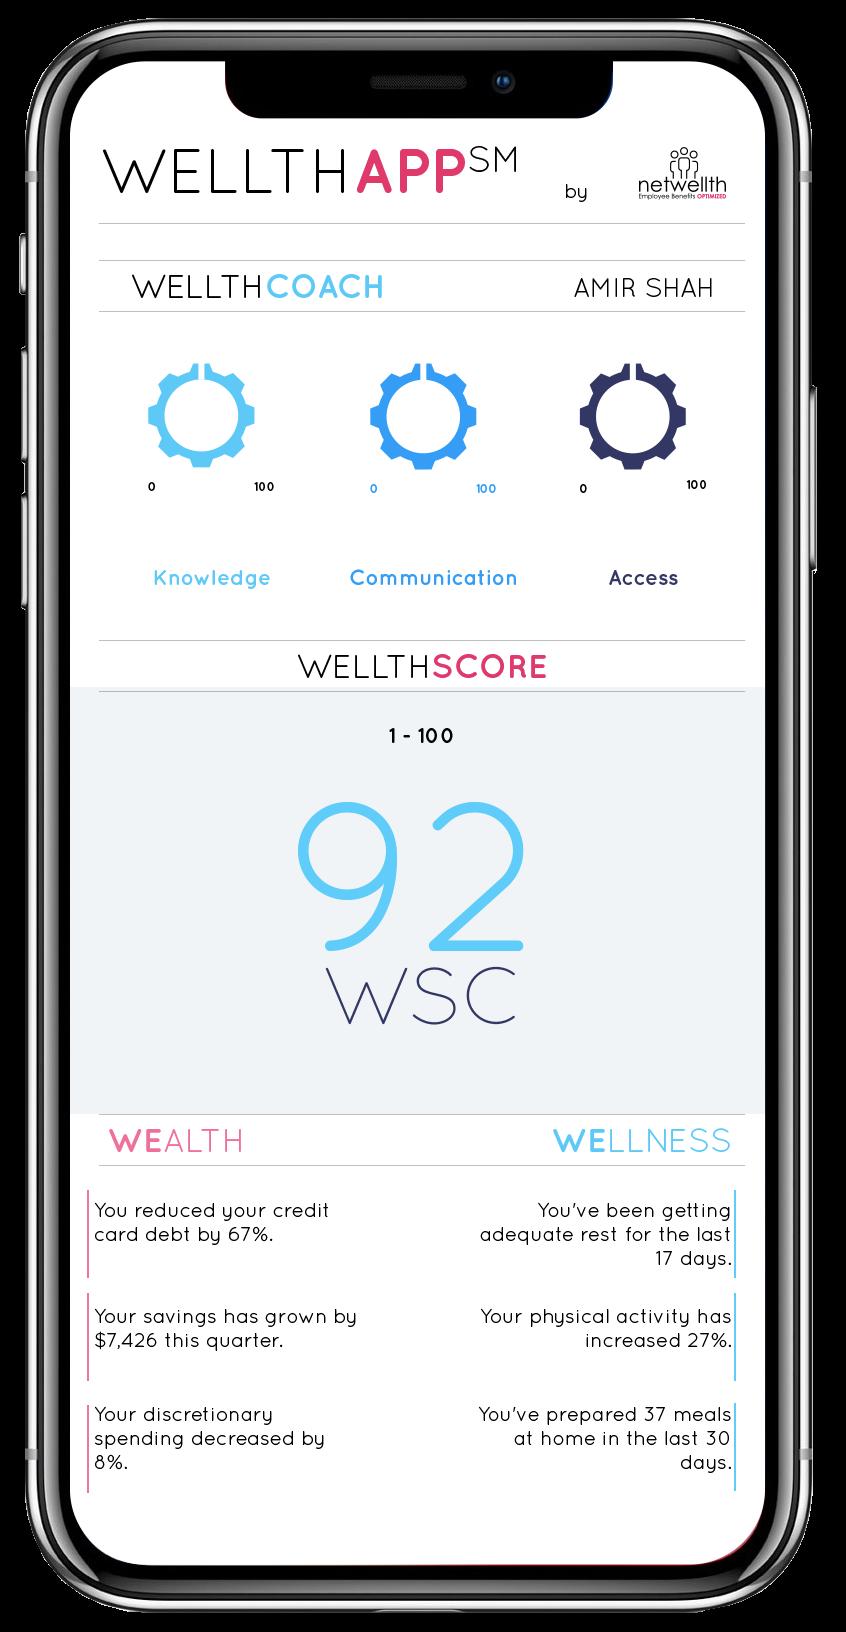 netwellth-wellth-app-01